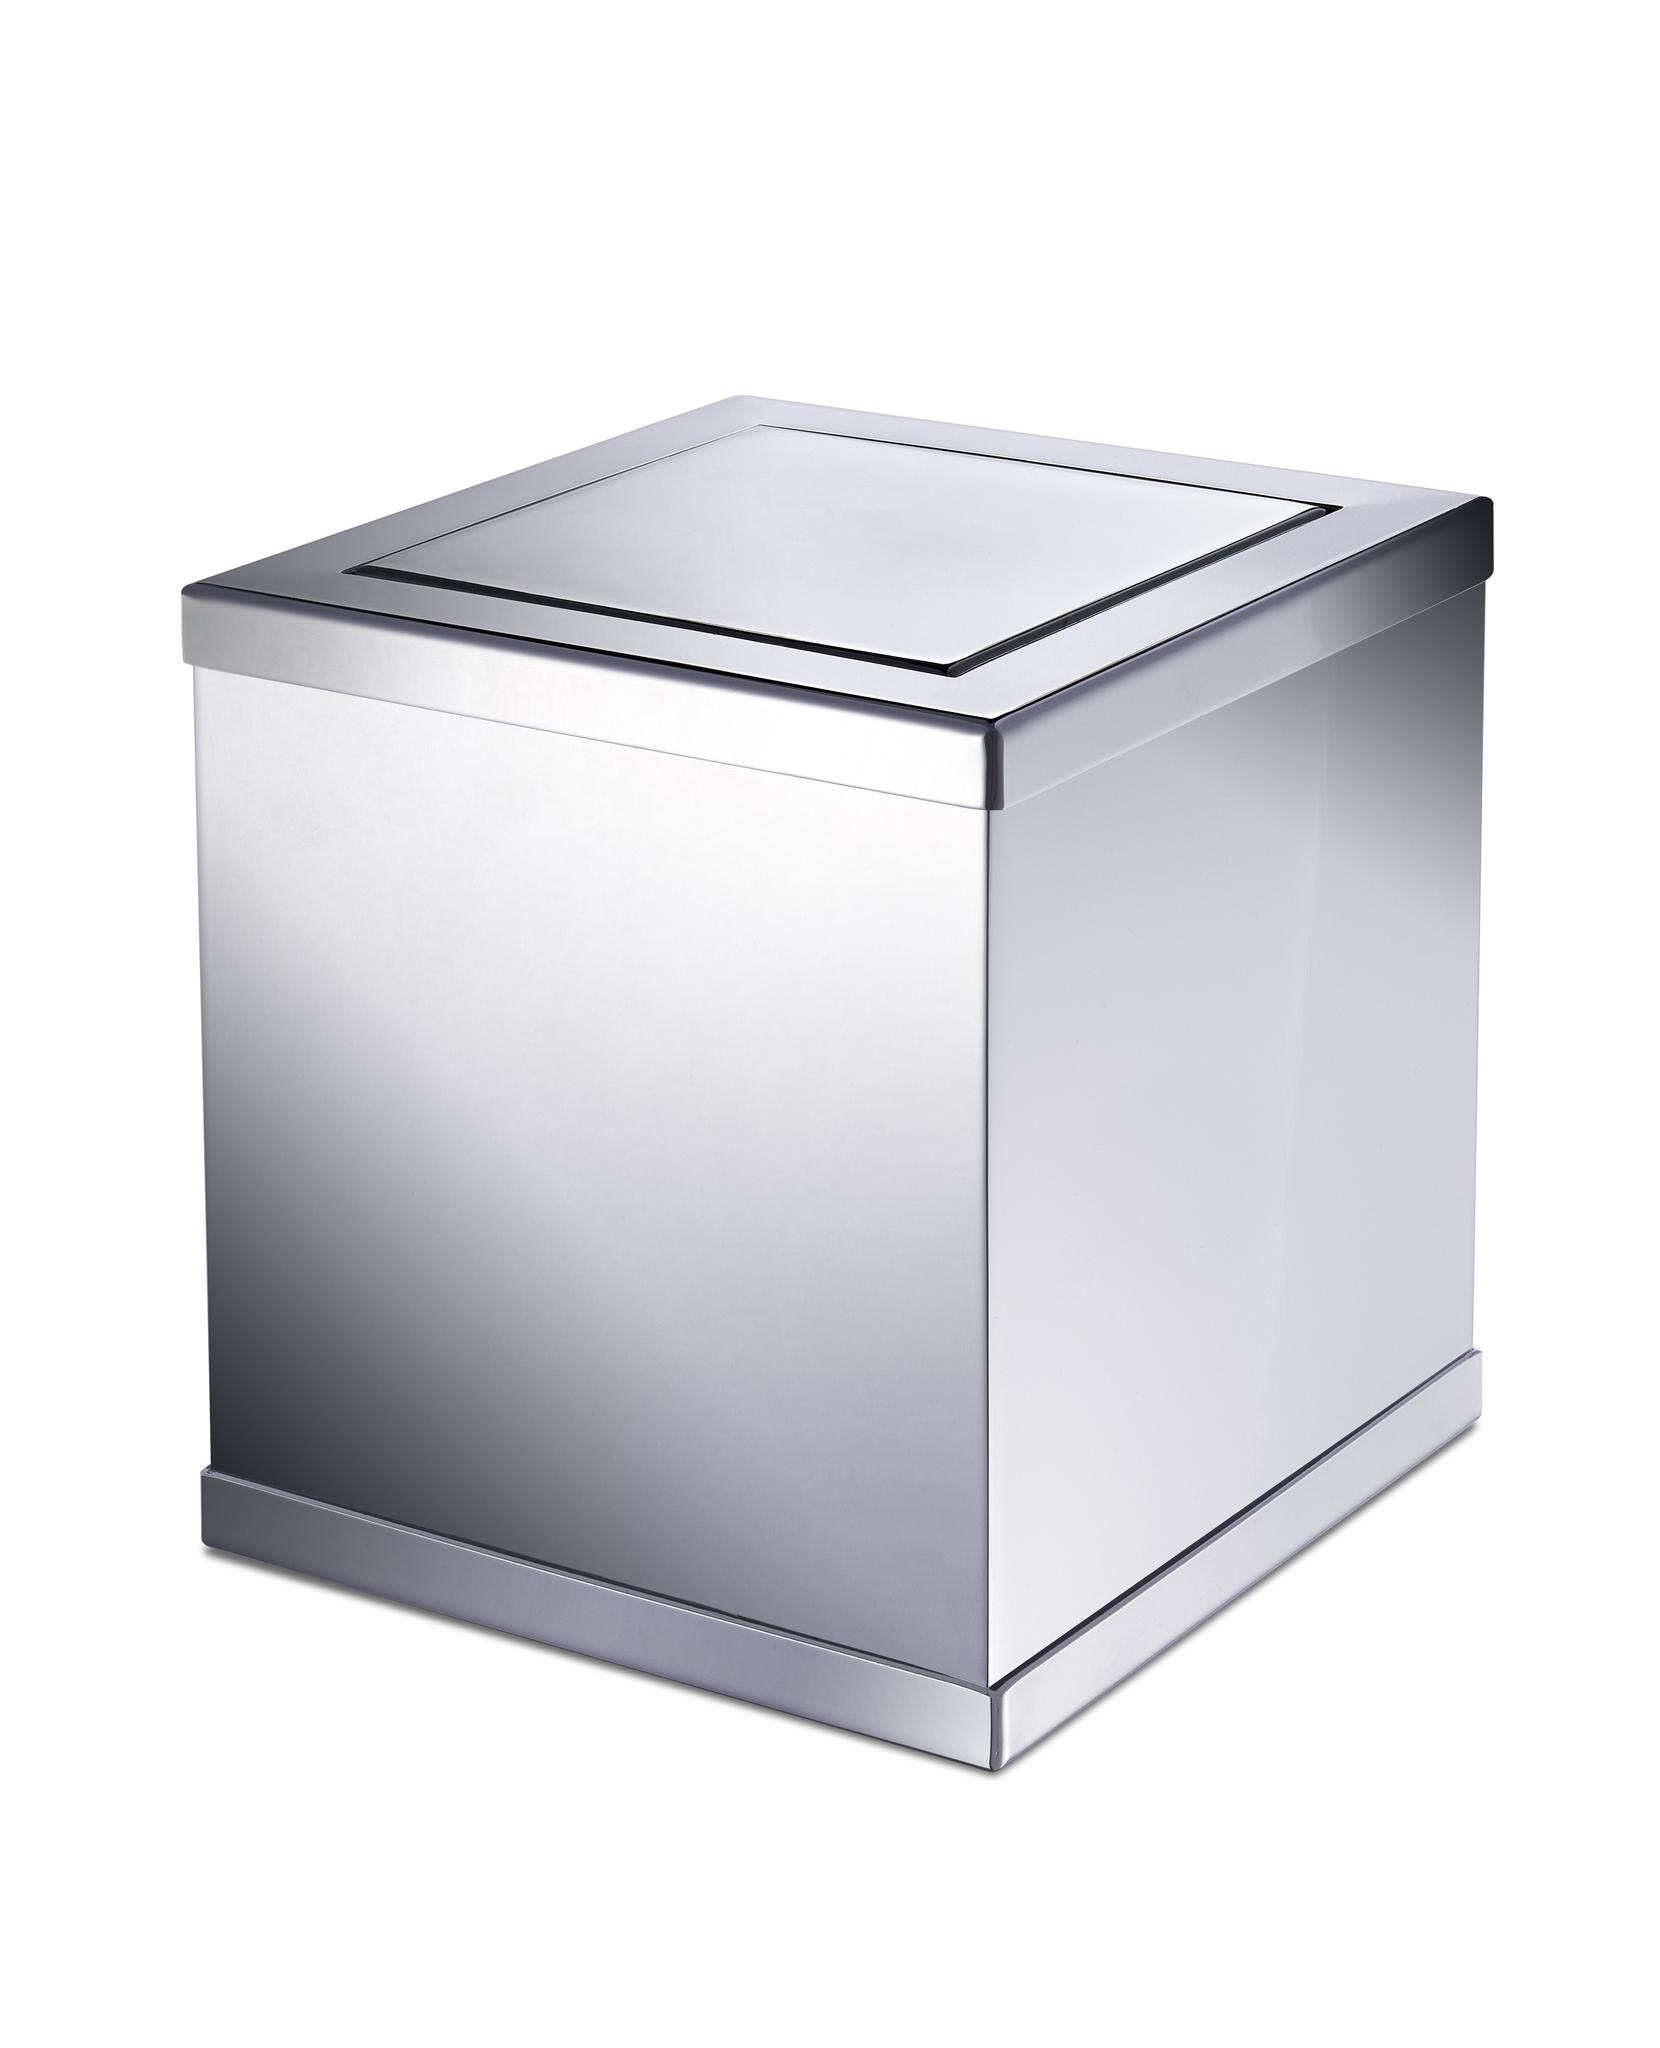 Ведра для мусора Мини-урна 89181CR от Windisch mini-urna-89181-ot-windisch-ispaniya.jpg